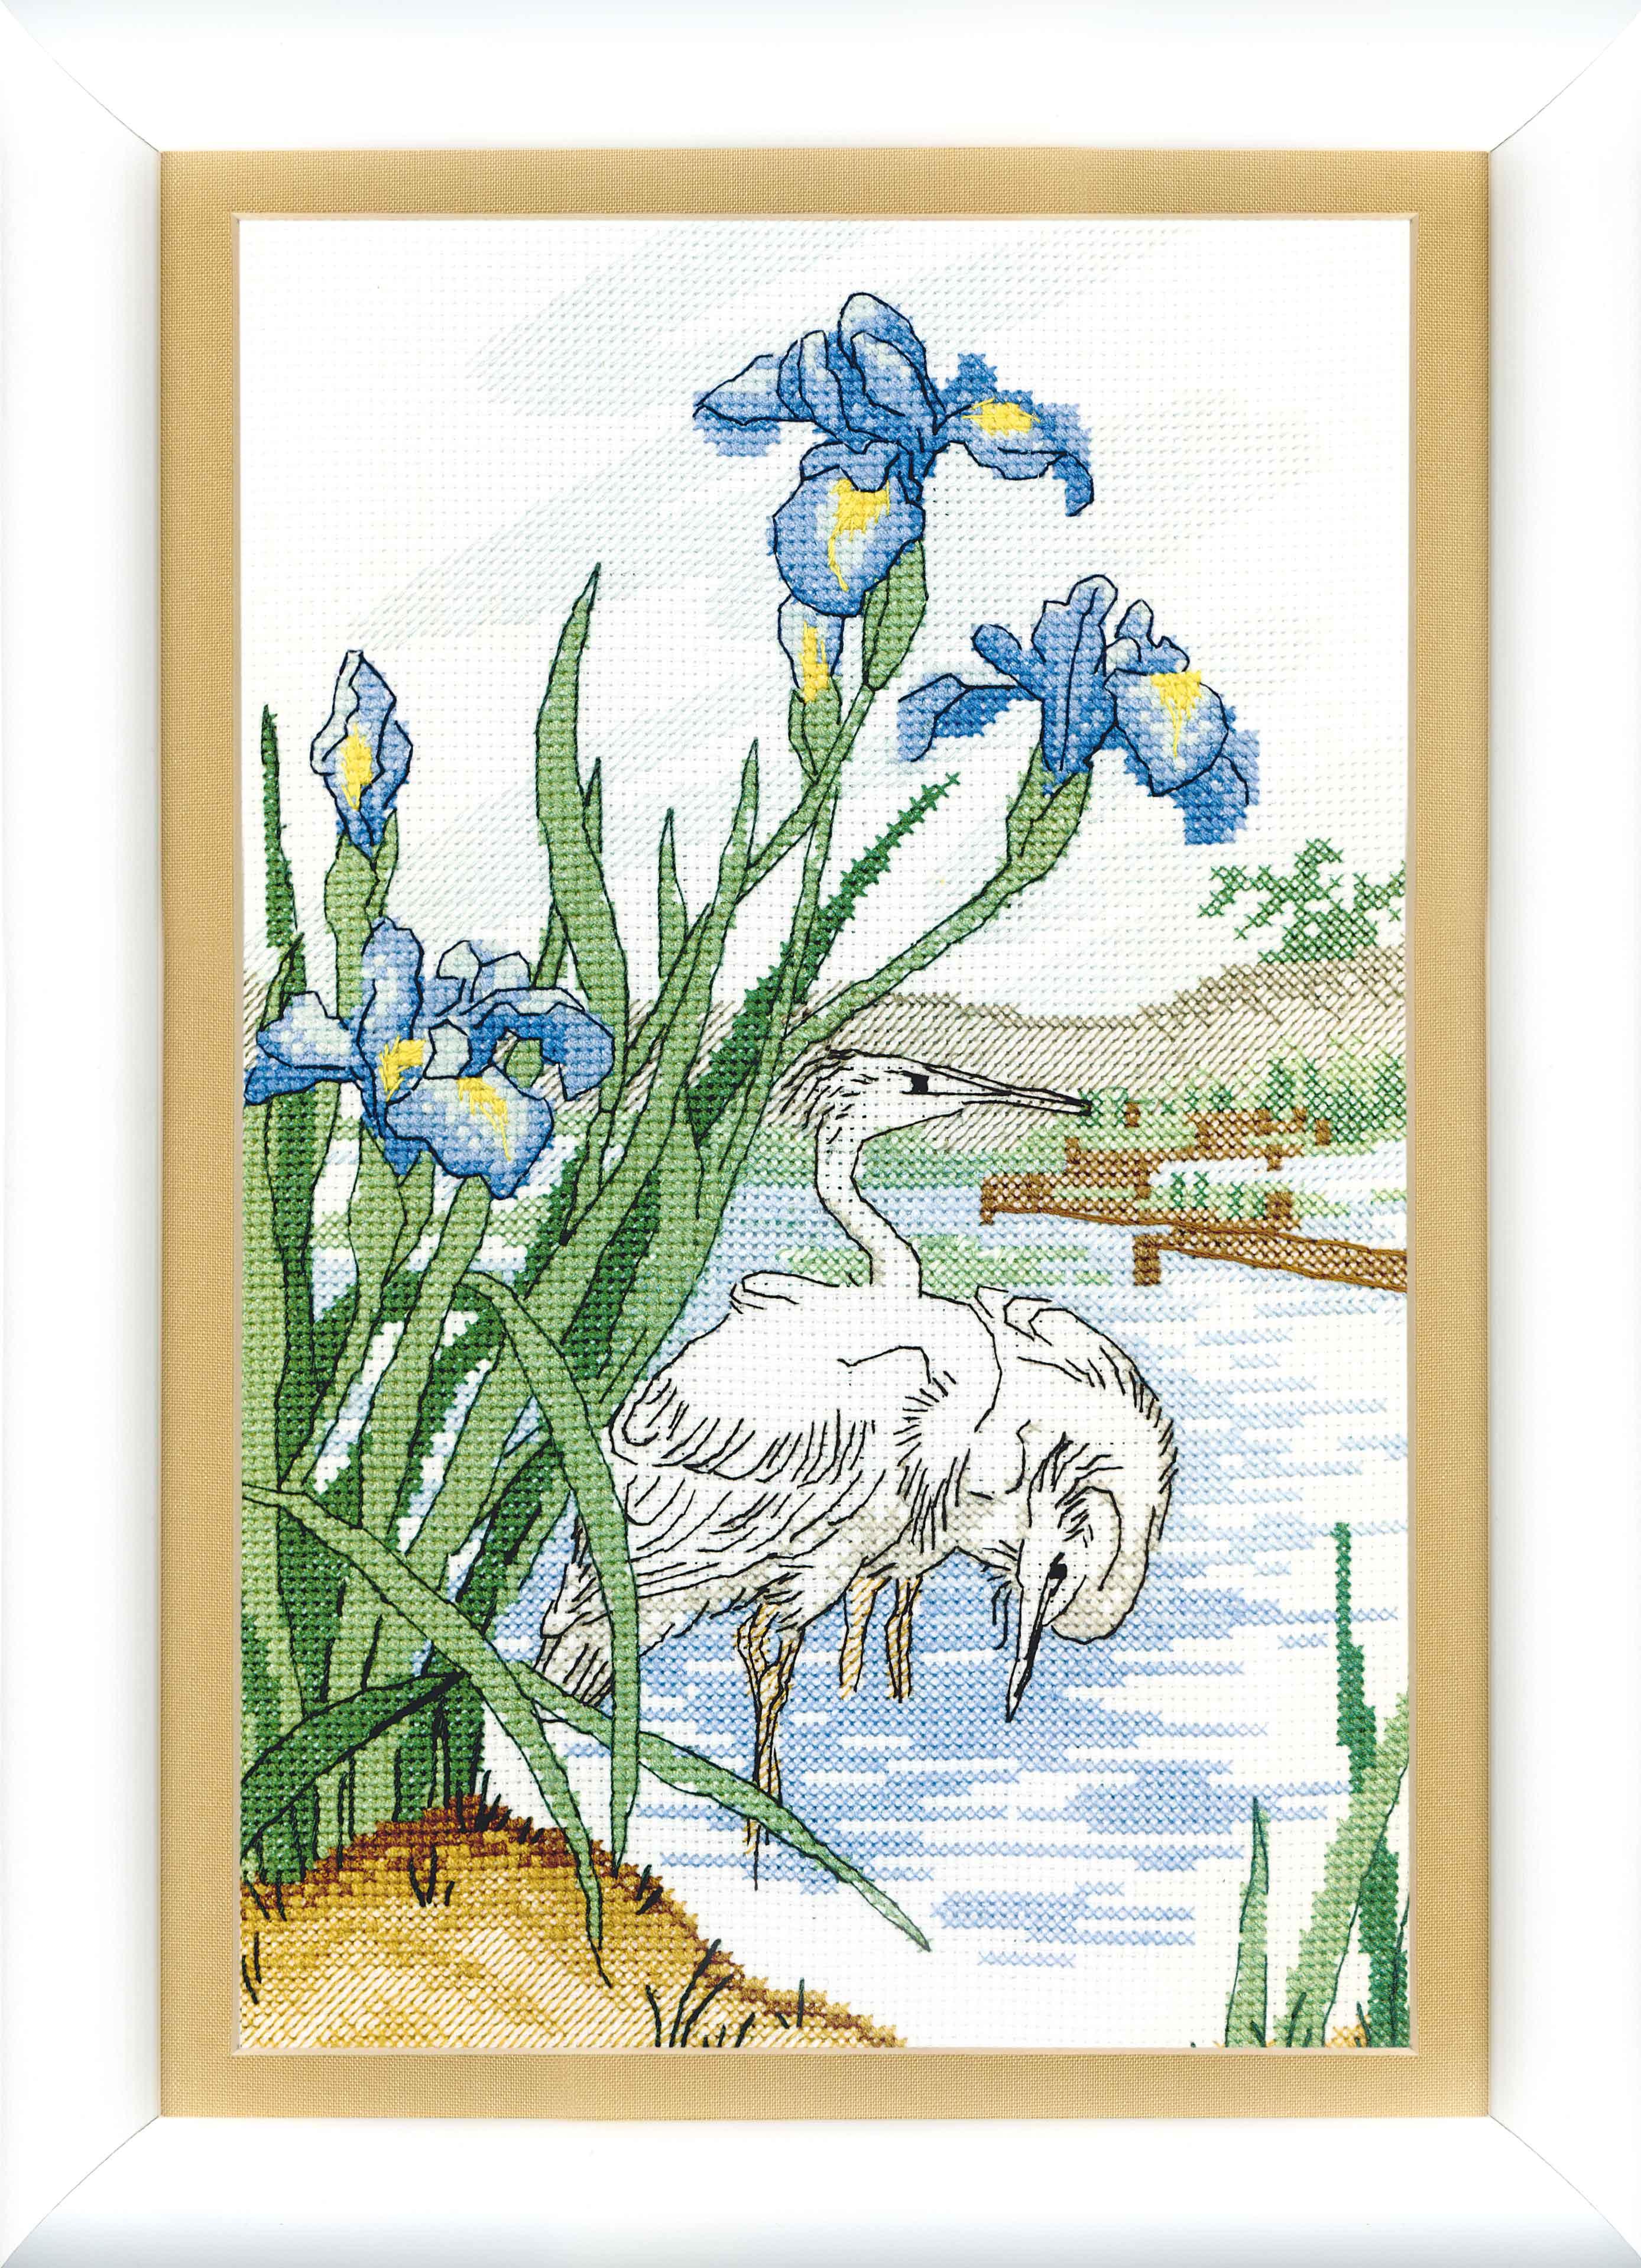 вышивка схема животные лебеди